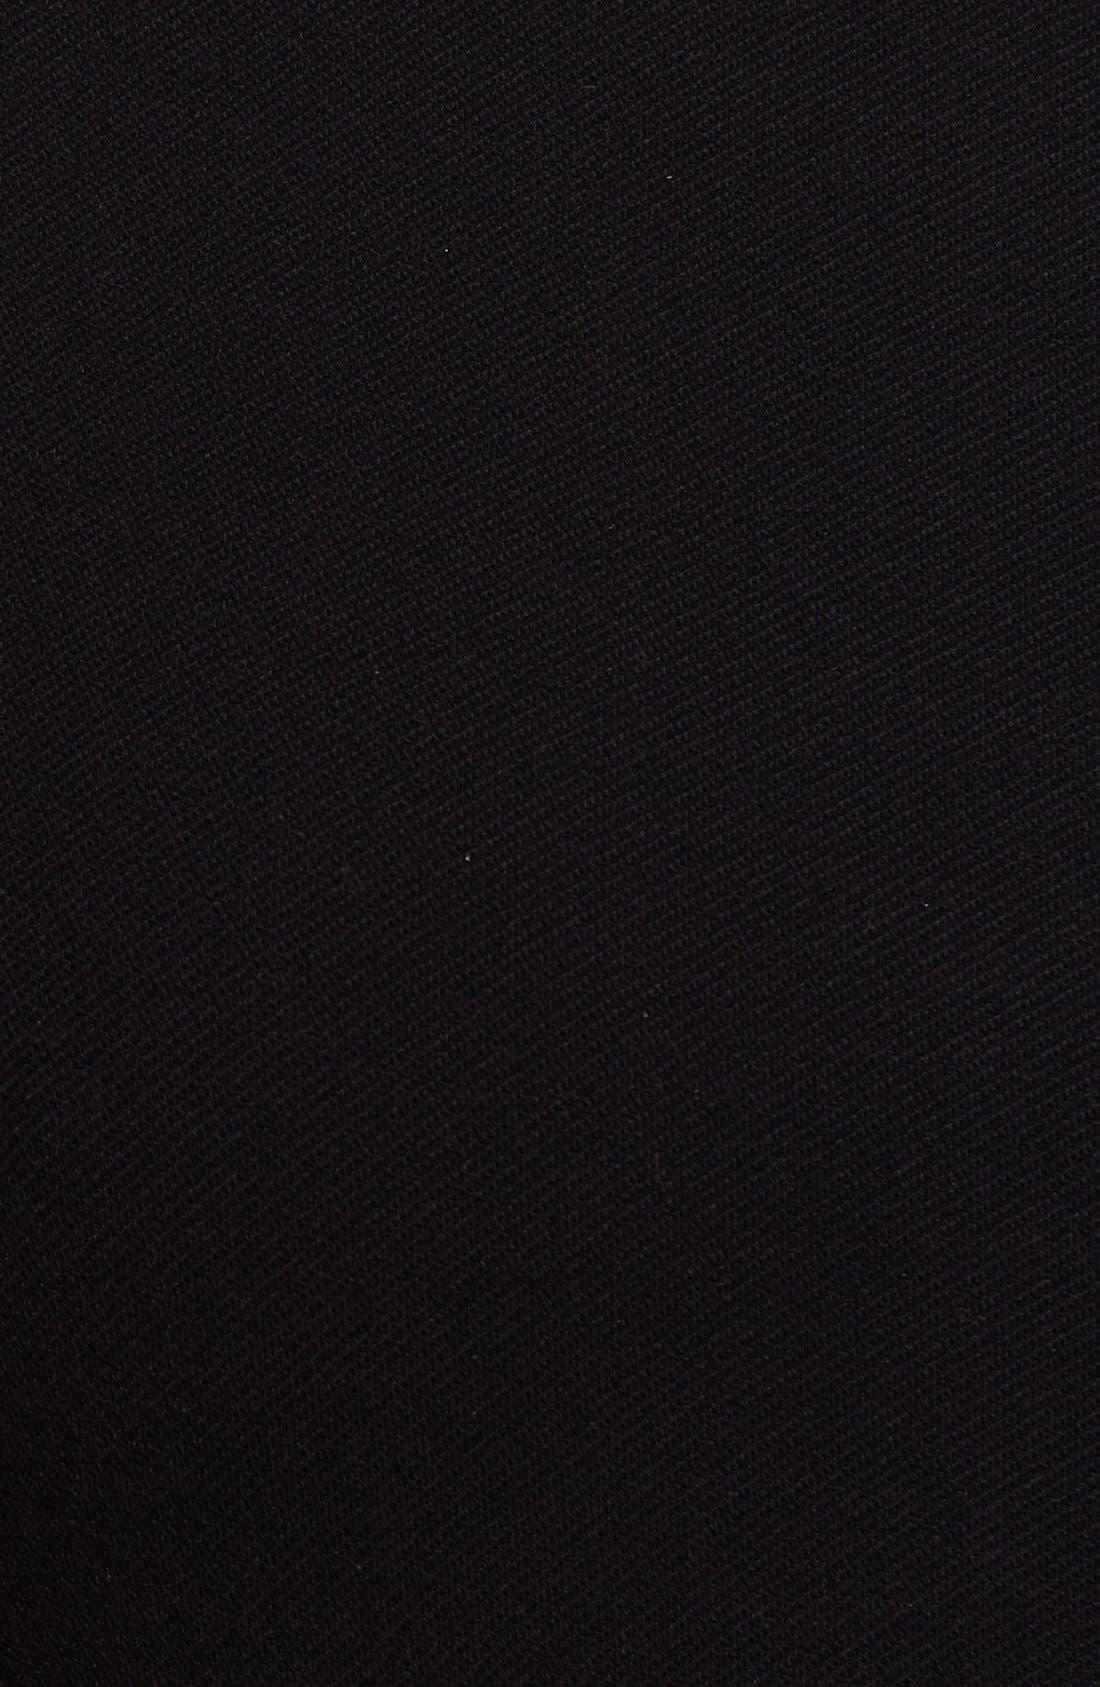 Alternate Image 3  - Helmut Lang 'Gala' Knit Dress